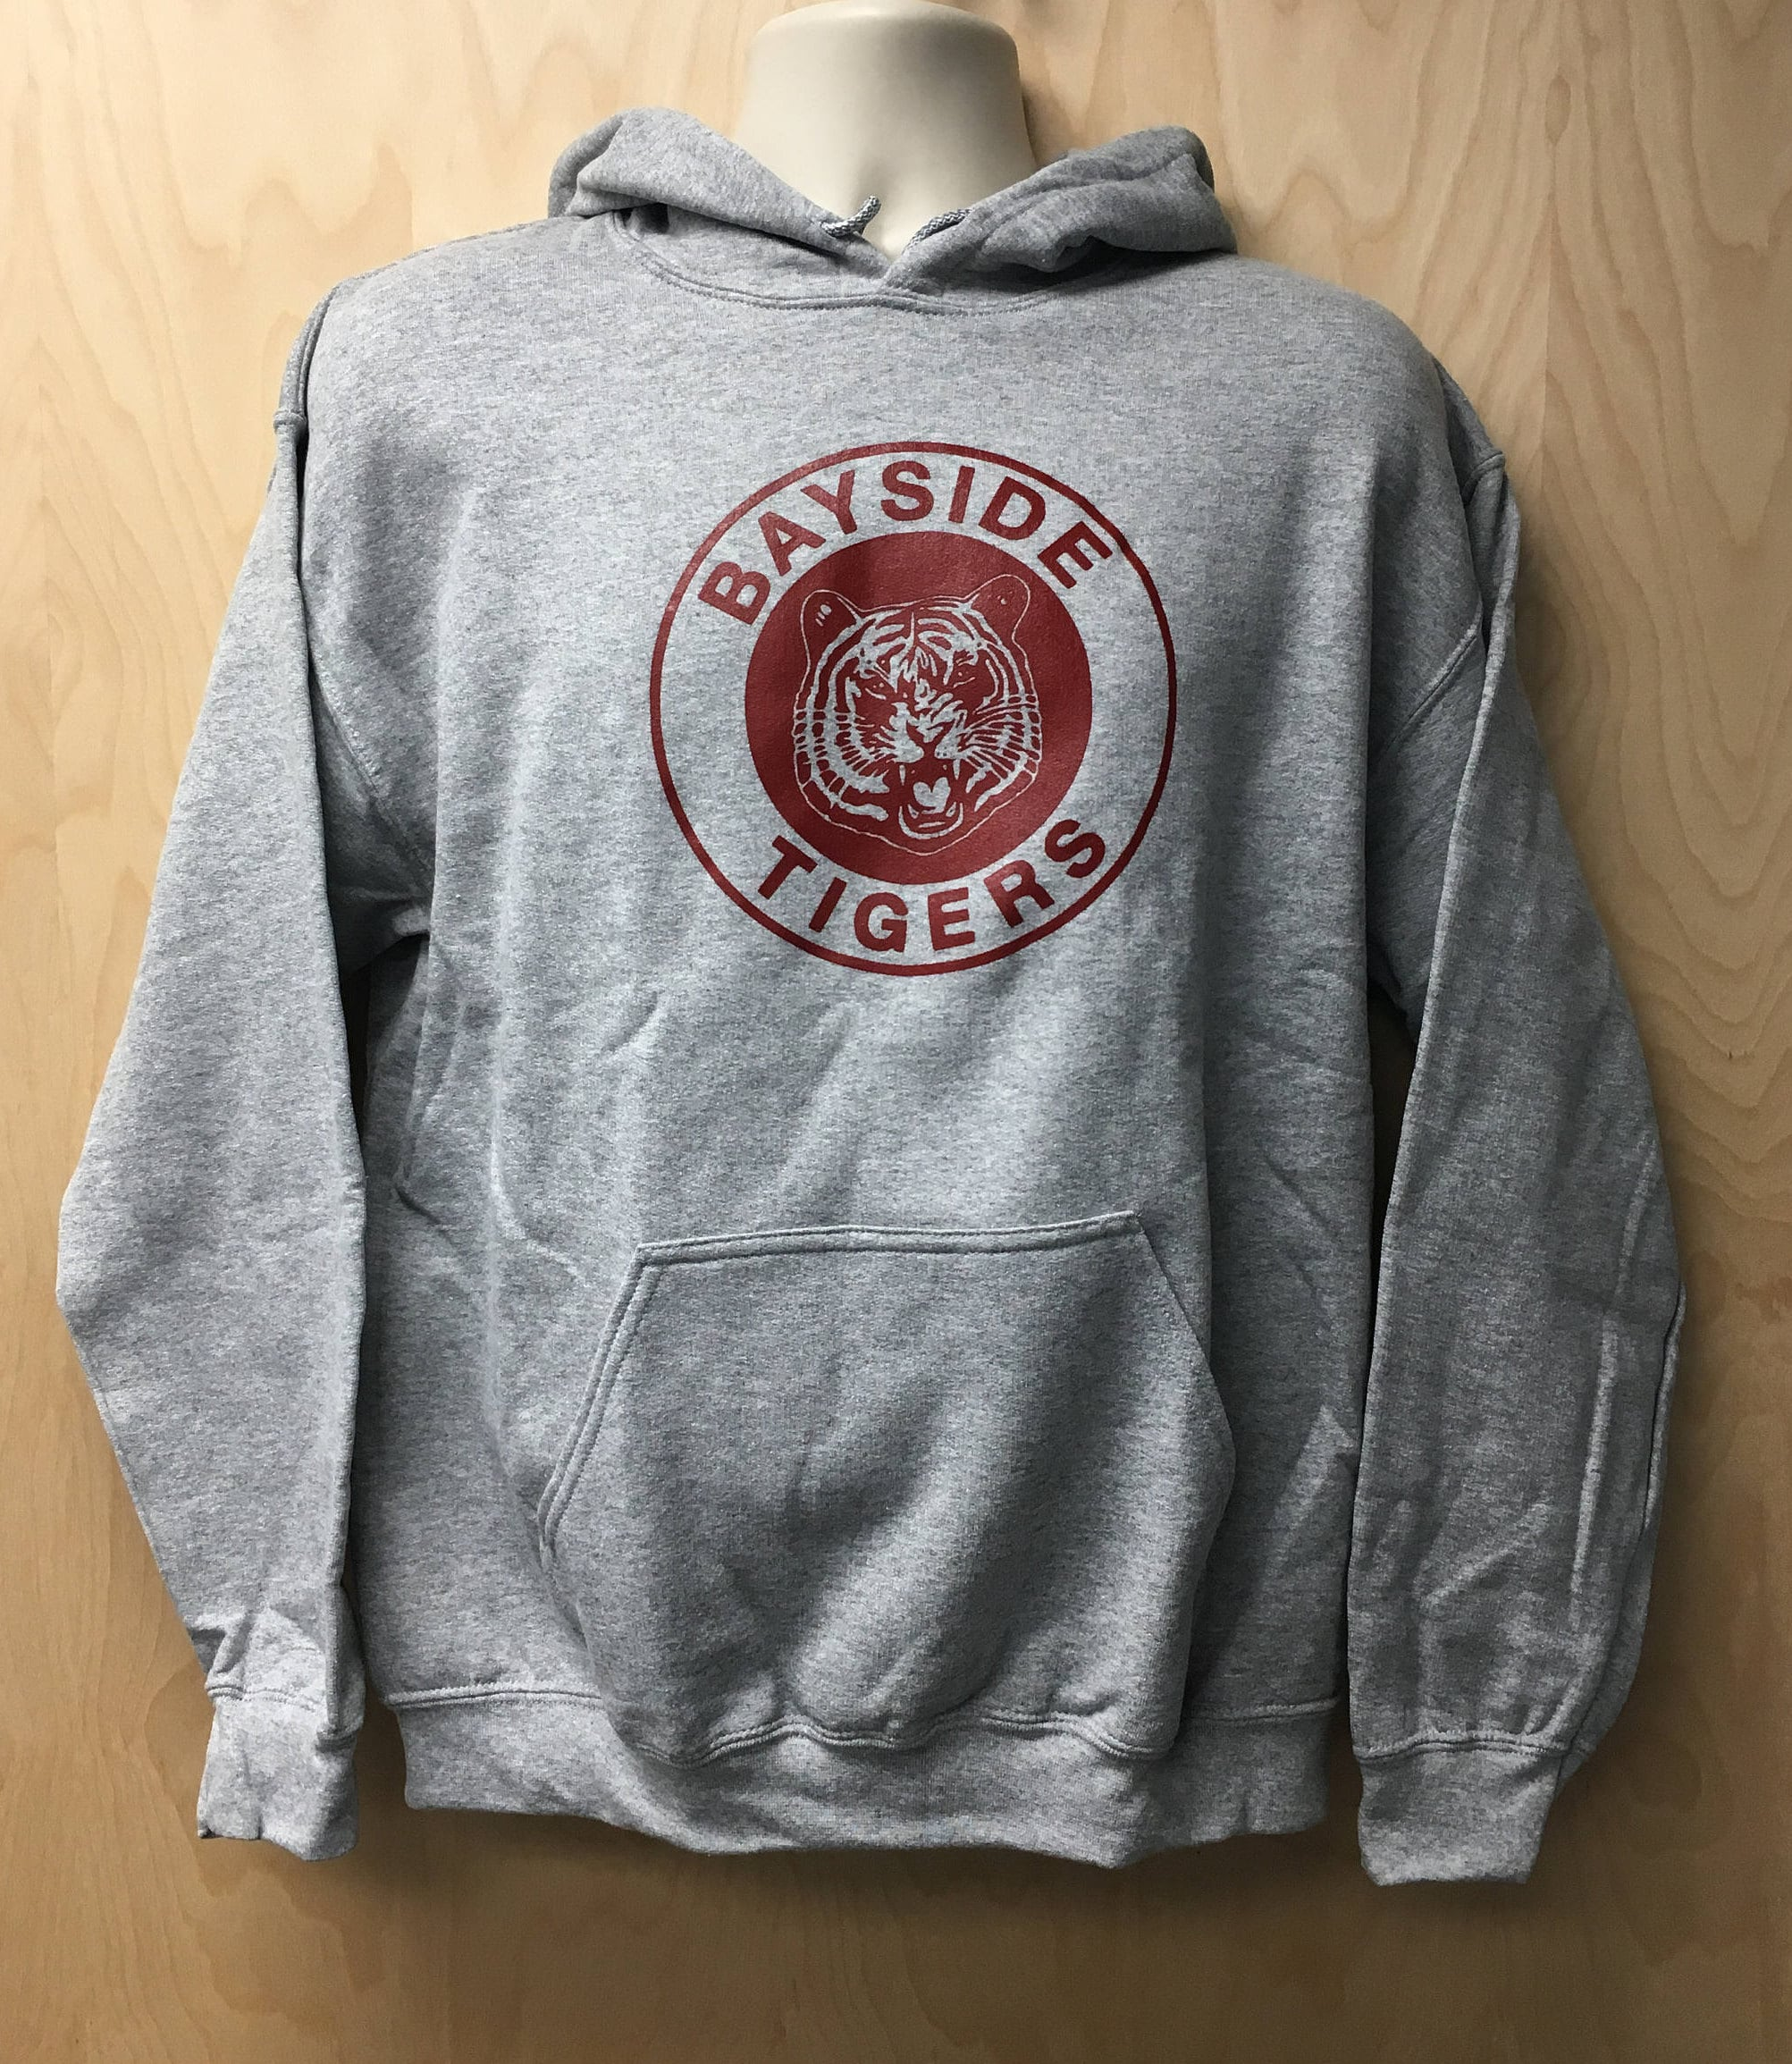 Bayside Tigers Logo Hooded Sweatshirt TV Show Zack Morris AC | Etsy